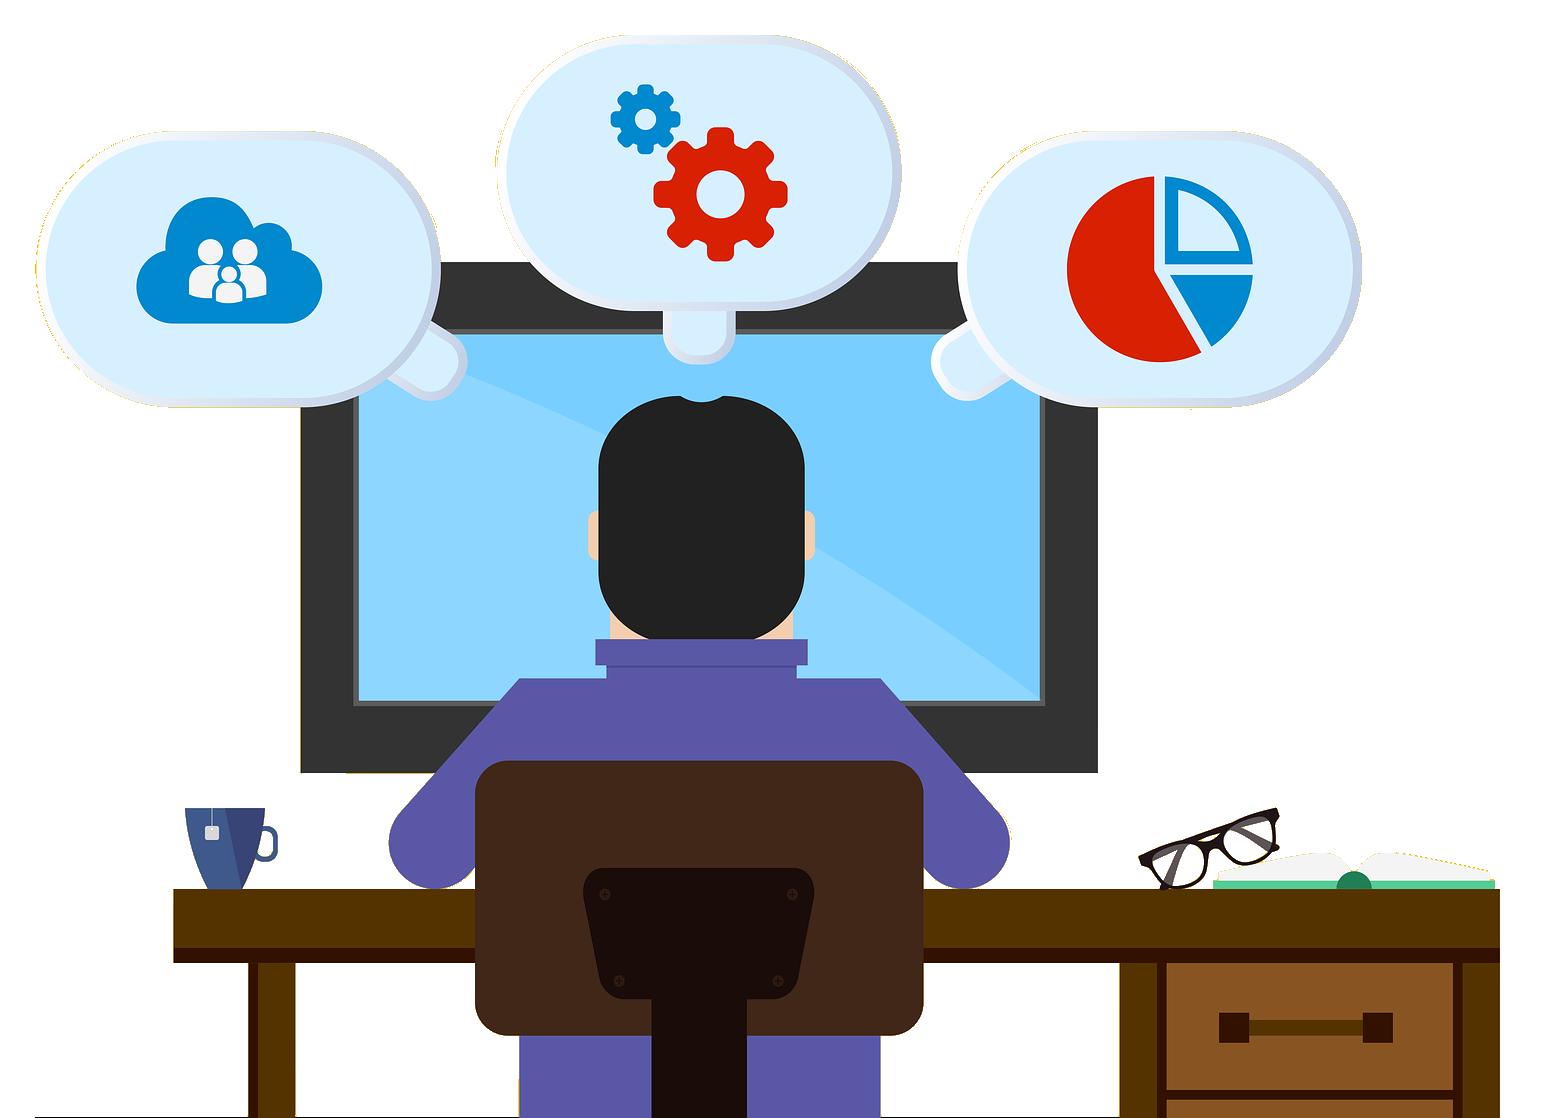 Software Development Expertise - empirical-software engineering